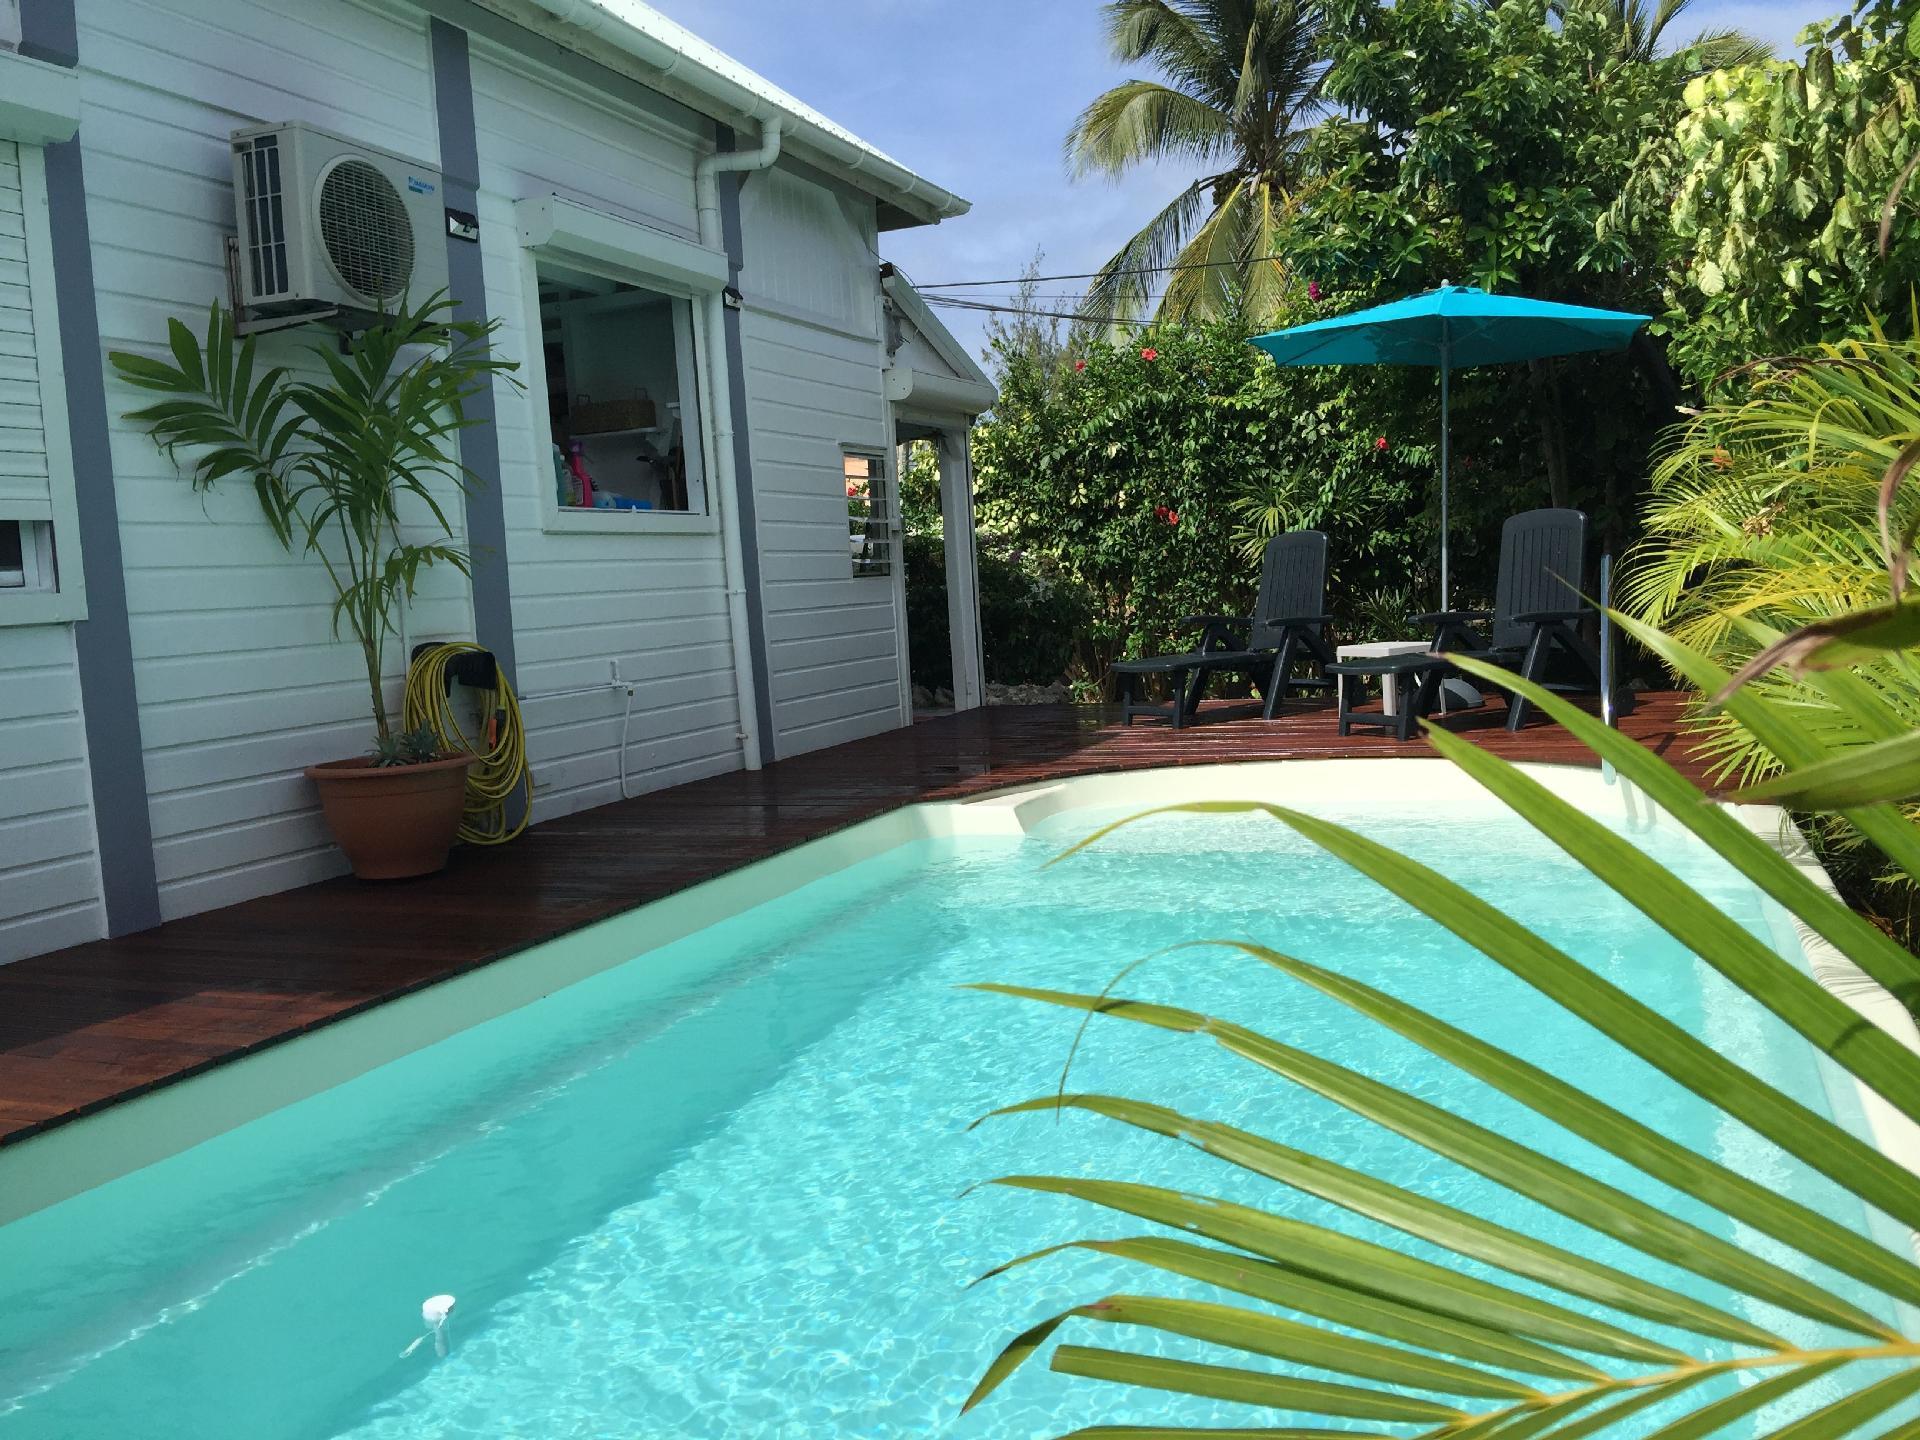 Ferienhaus mit Privatpool für 6 Personen ca.   in Guadeloupe